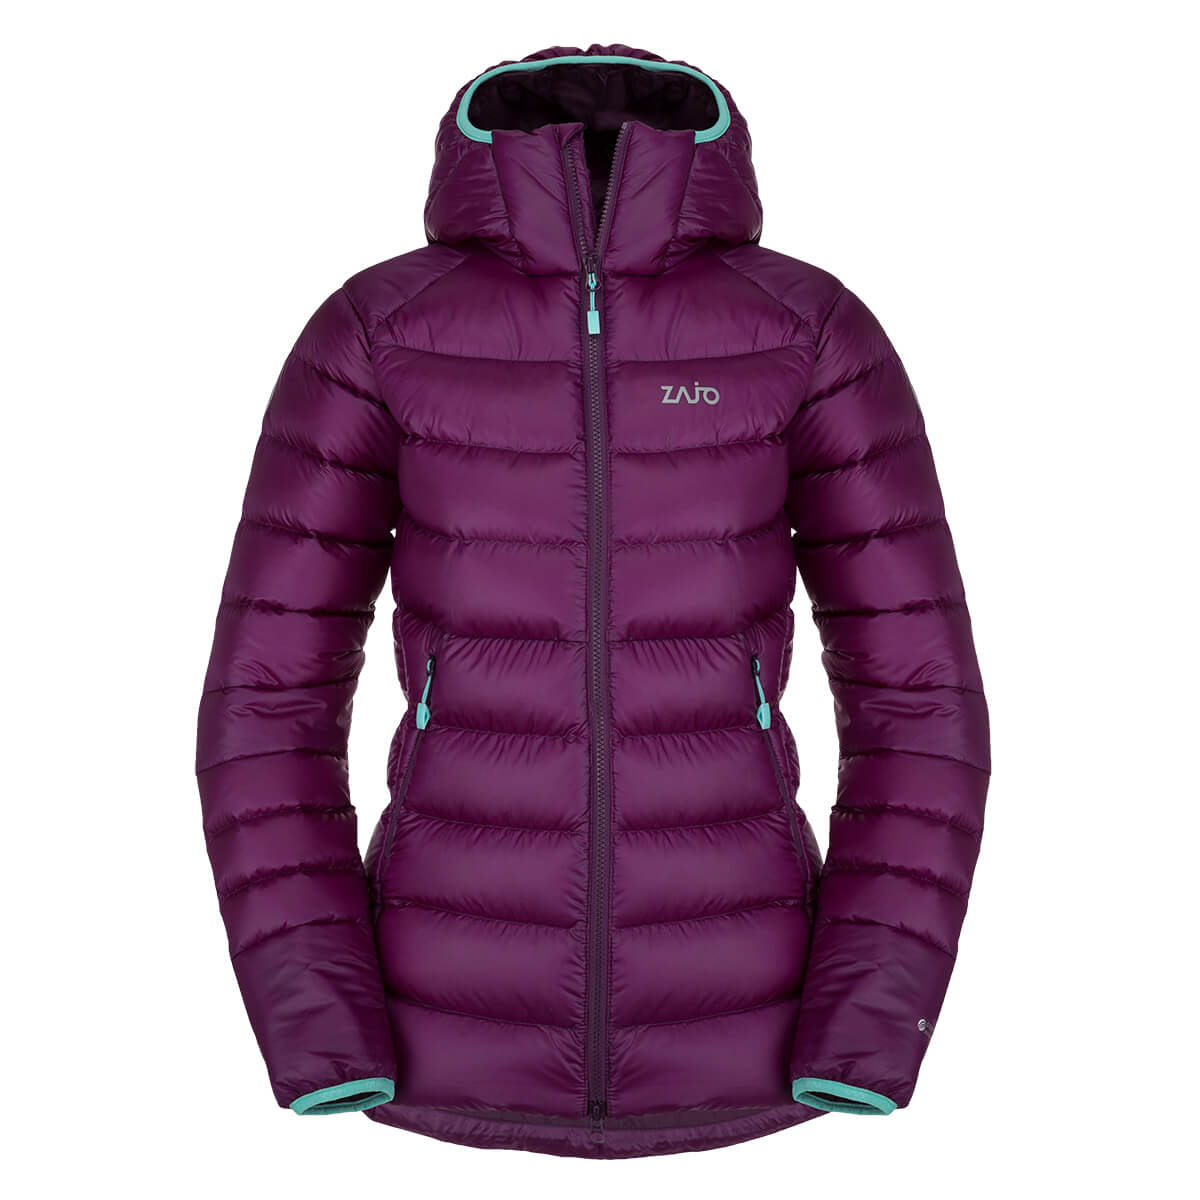 Dámska bunda Zajo Valbella W JKT Dark Purple - veľkosť XS